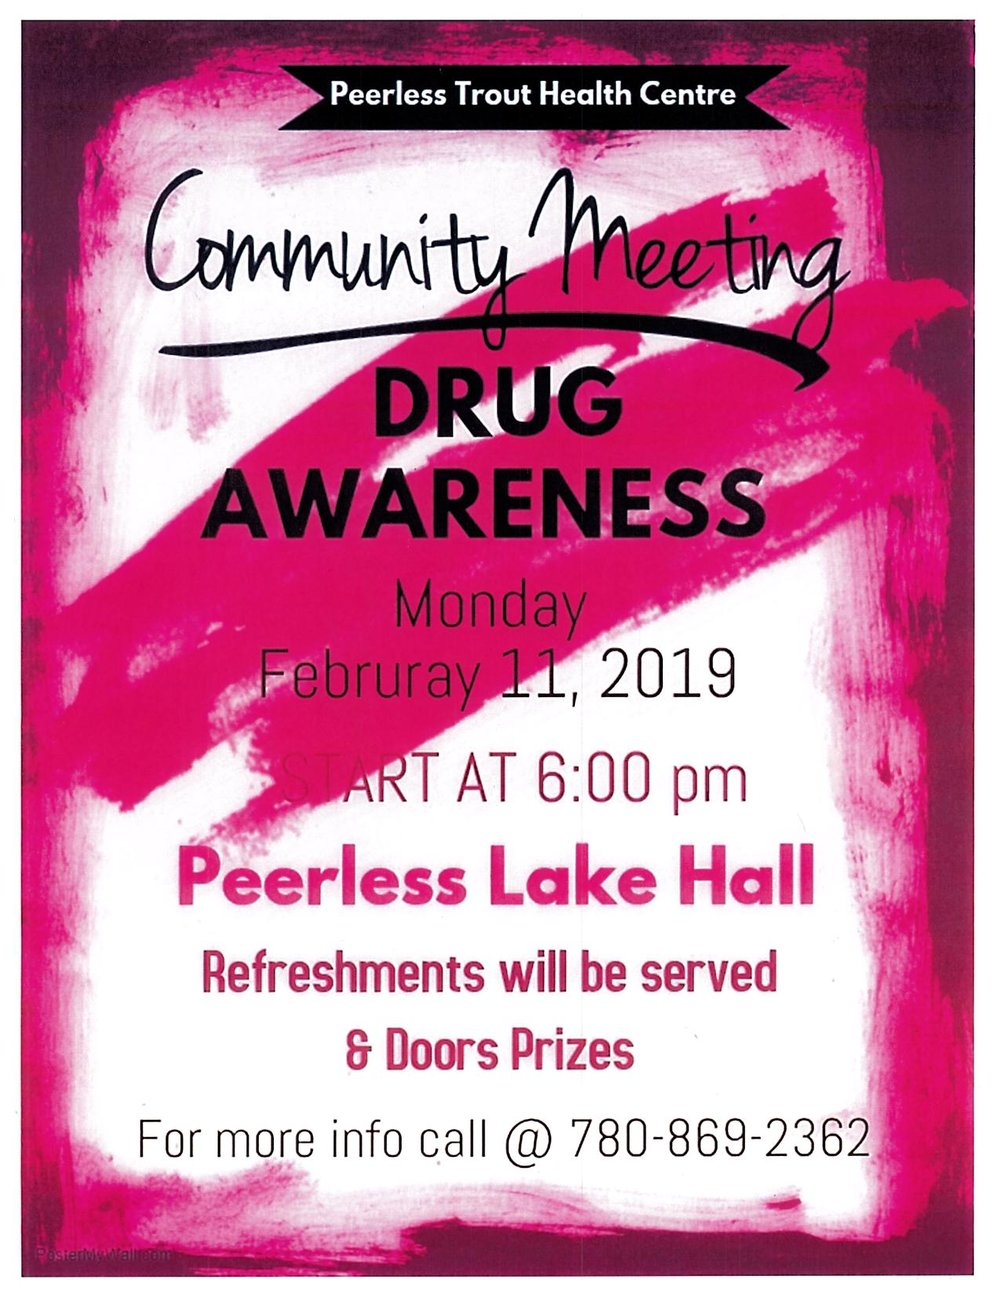 drug awareness meeting .jpg